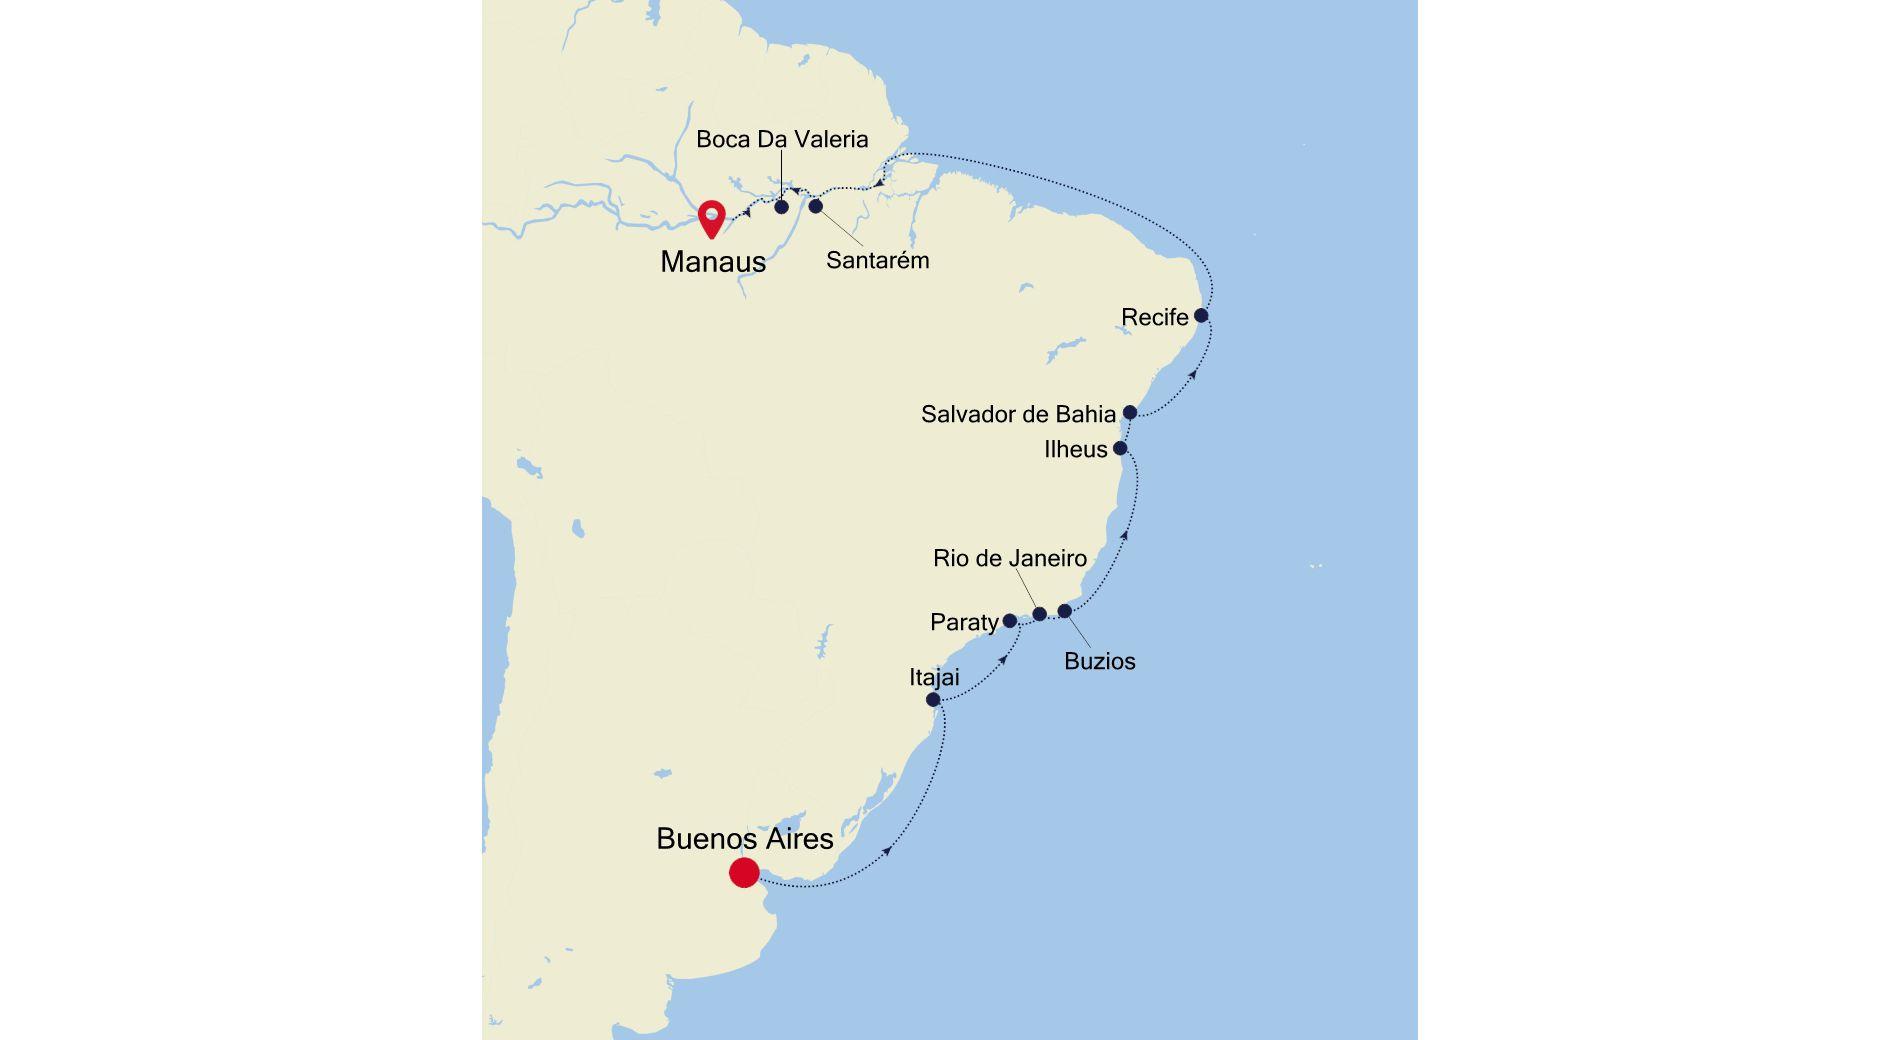 DA220209021 - Buenos Aires à Manaus